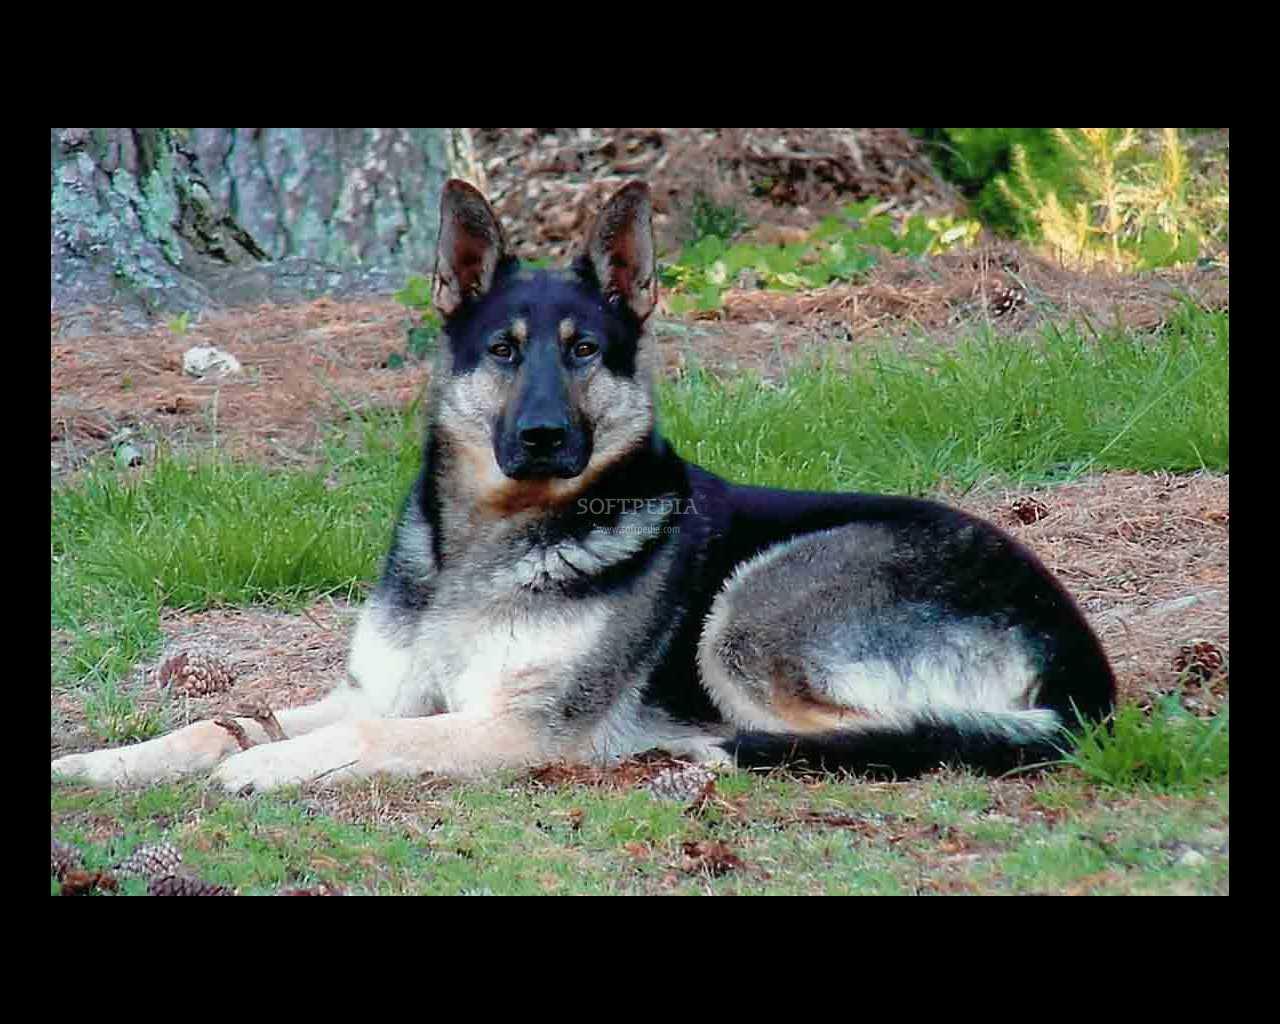 German Shepherd Screensaver   The German Shepherd Screensaver window 1280x1024